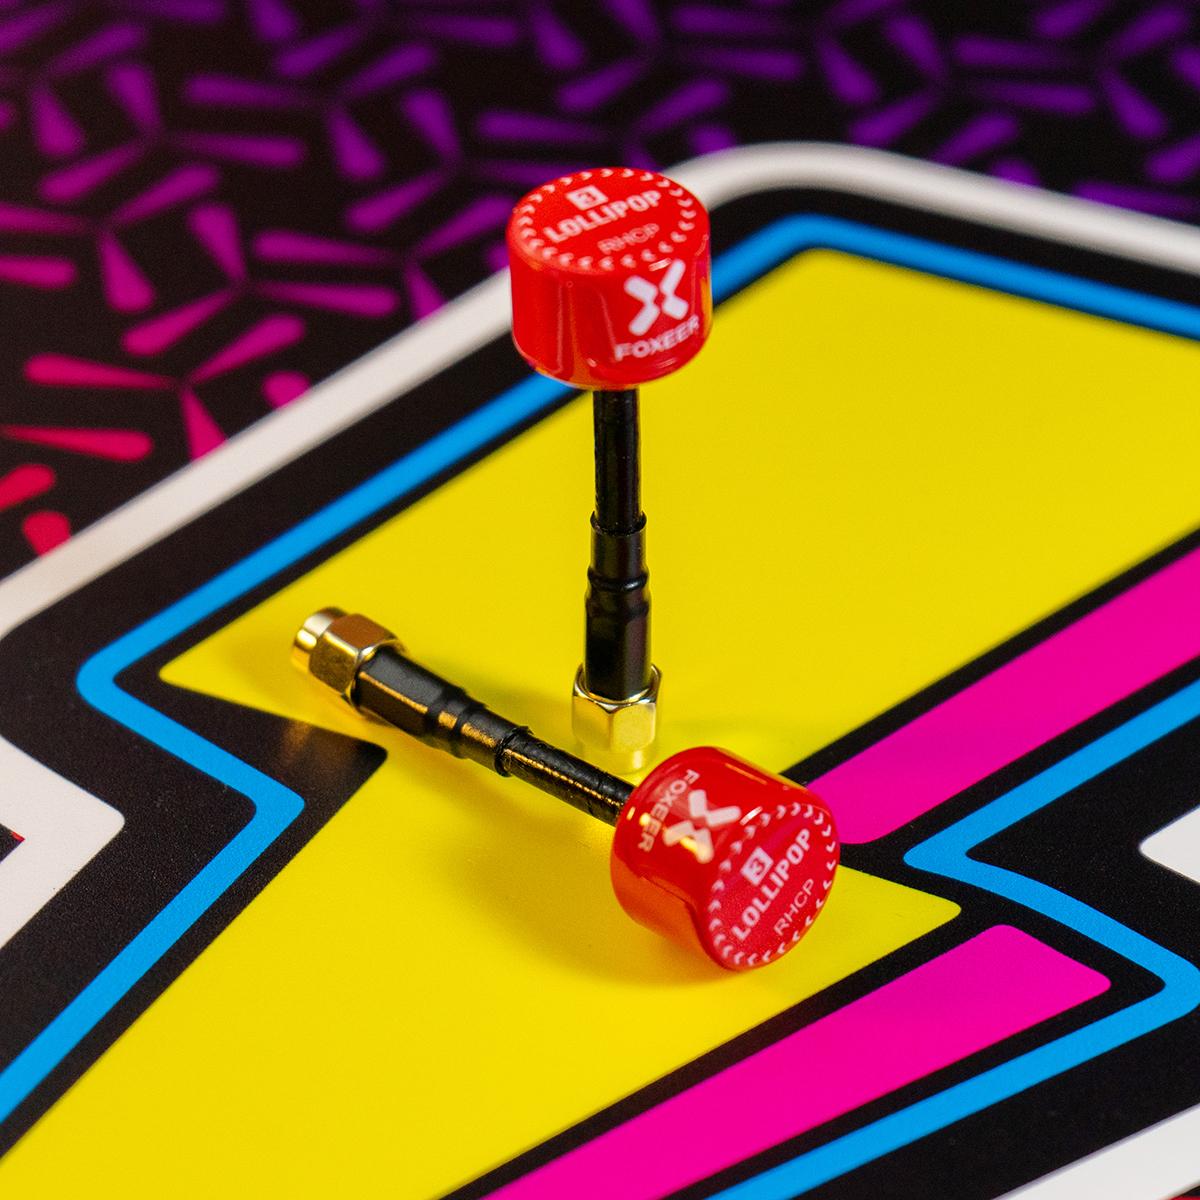 foxeer lollipop v3 antenna